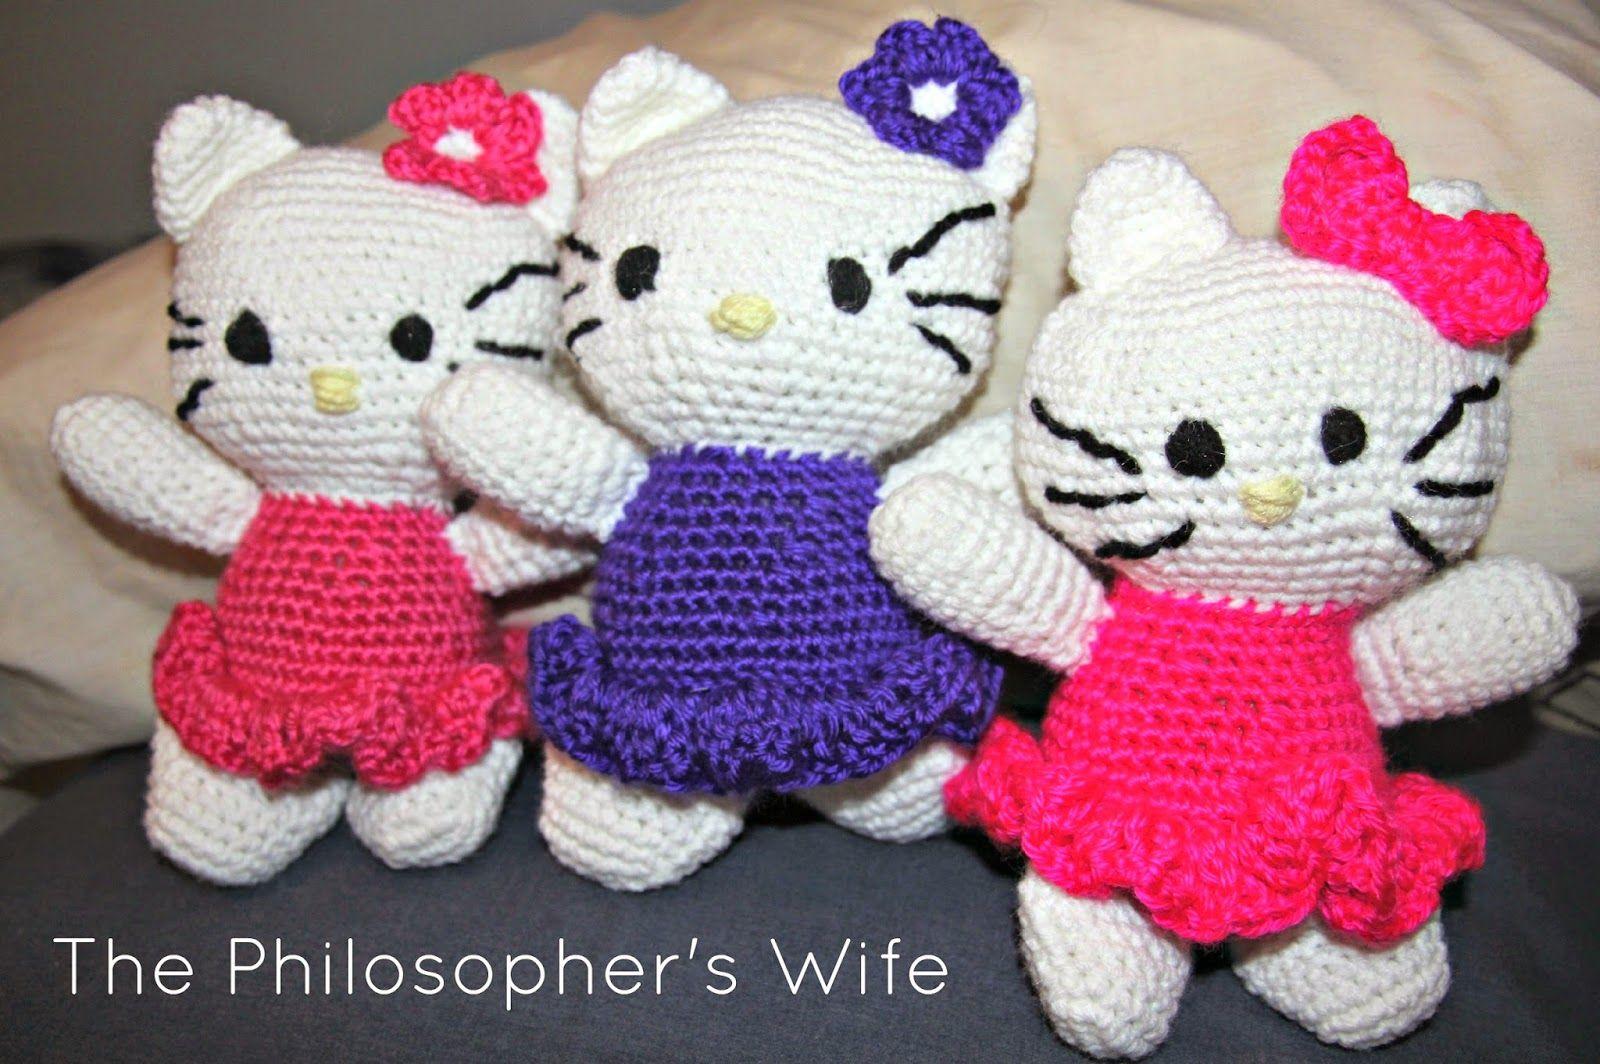 Pin De Cindy Ayala En Mis Muñequitos: The Philosopher's Wife: Crocheted Hello Kitty Dolls